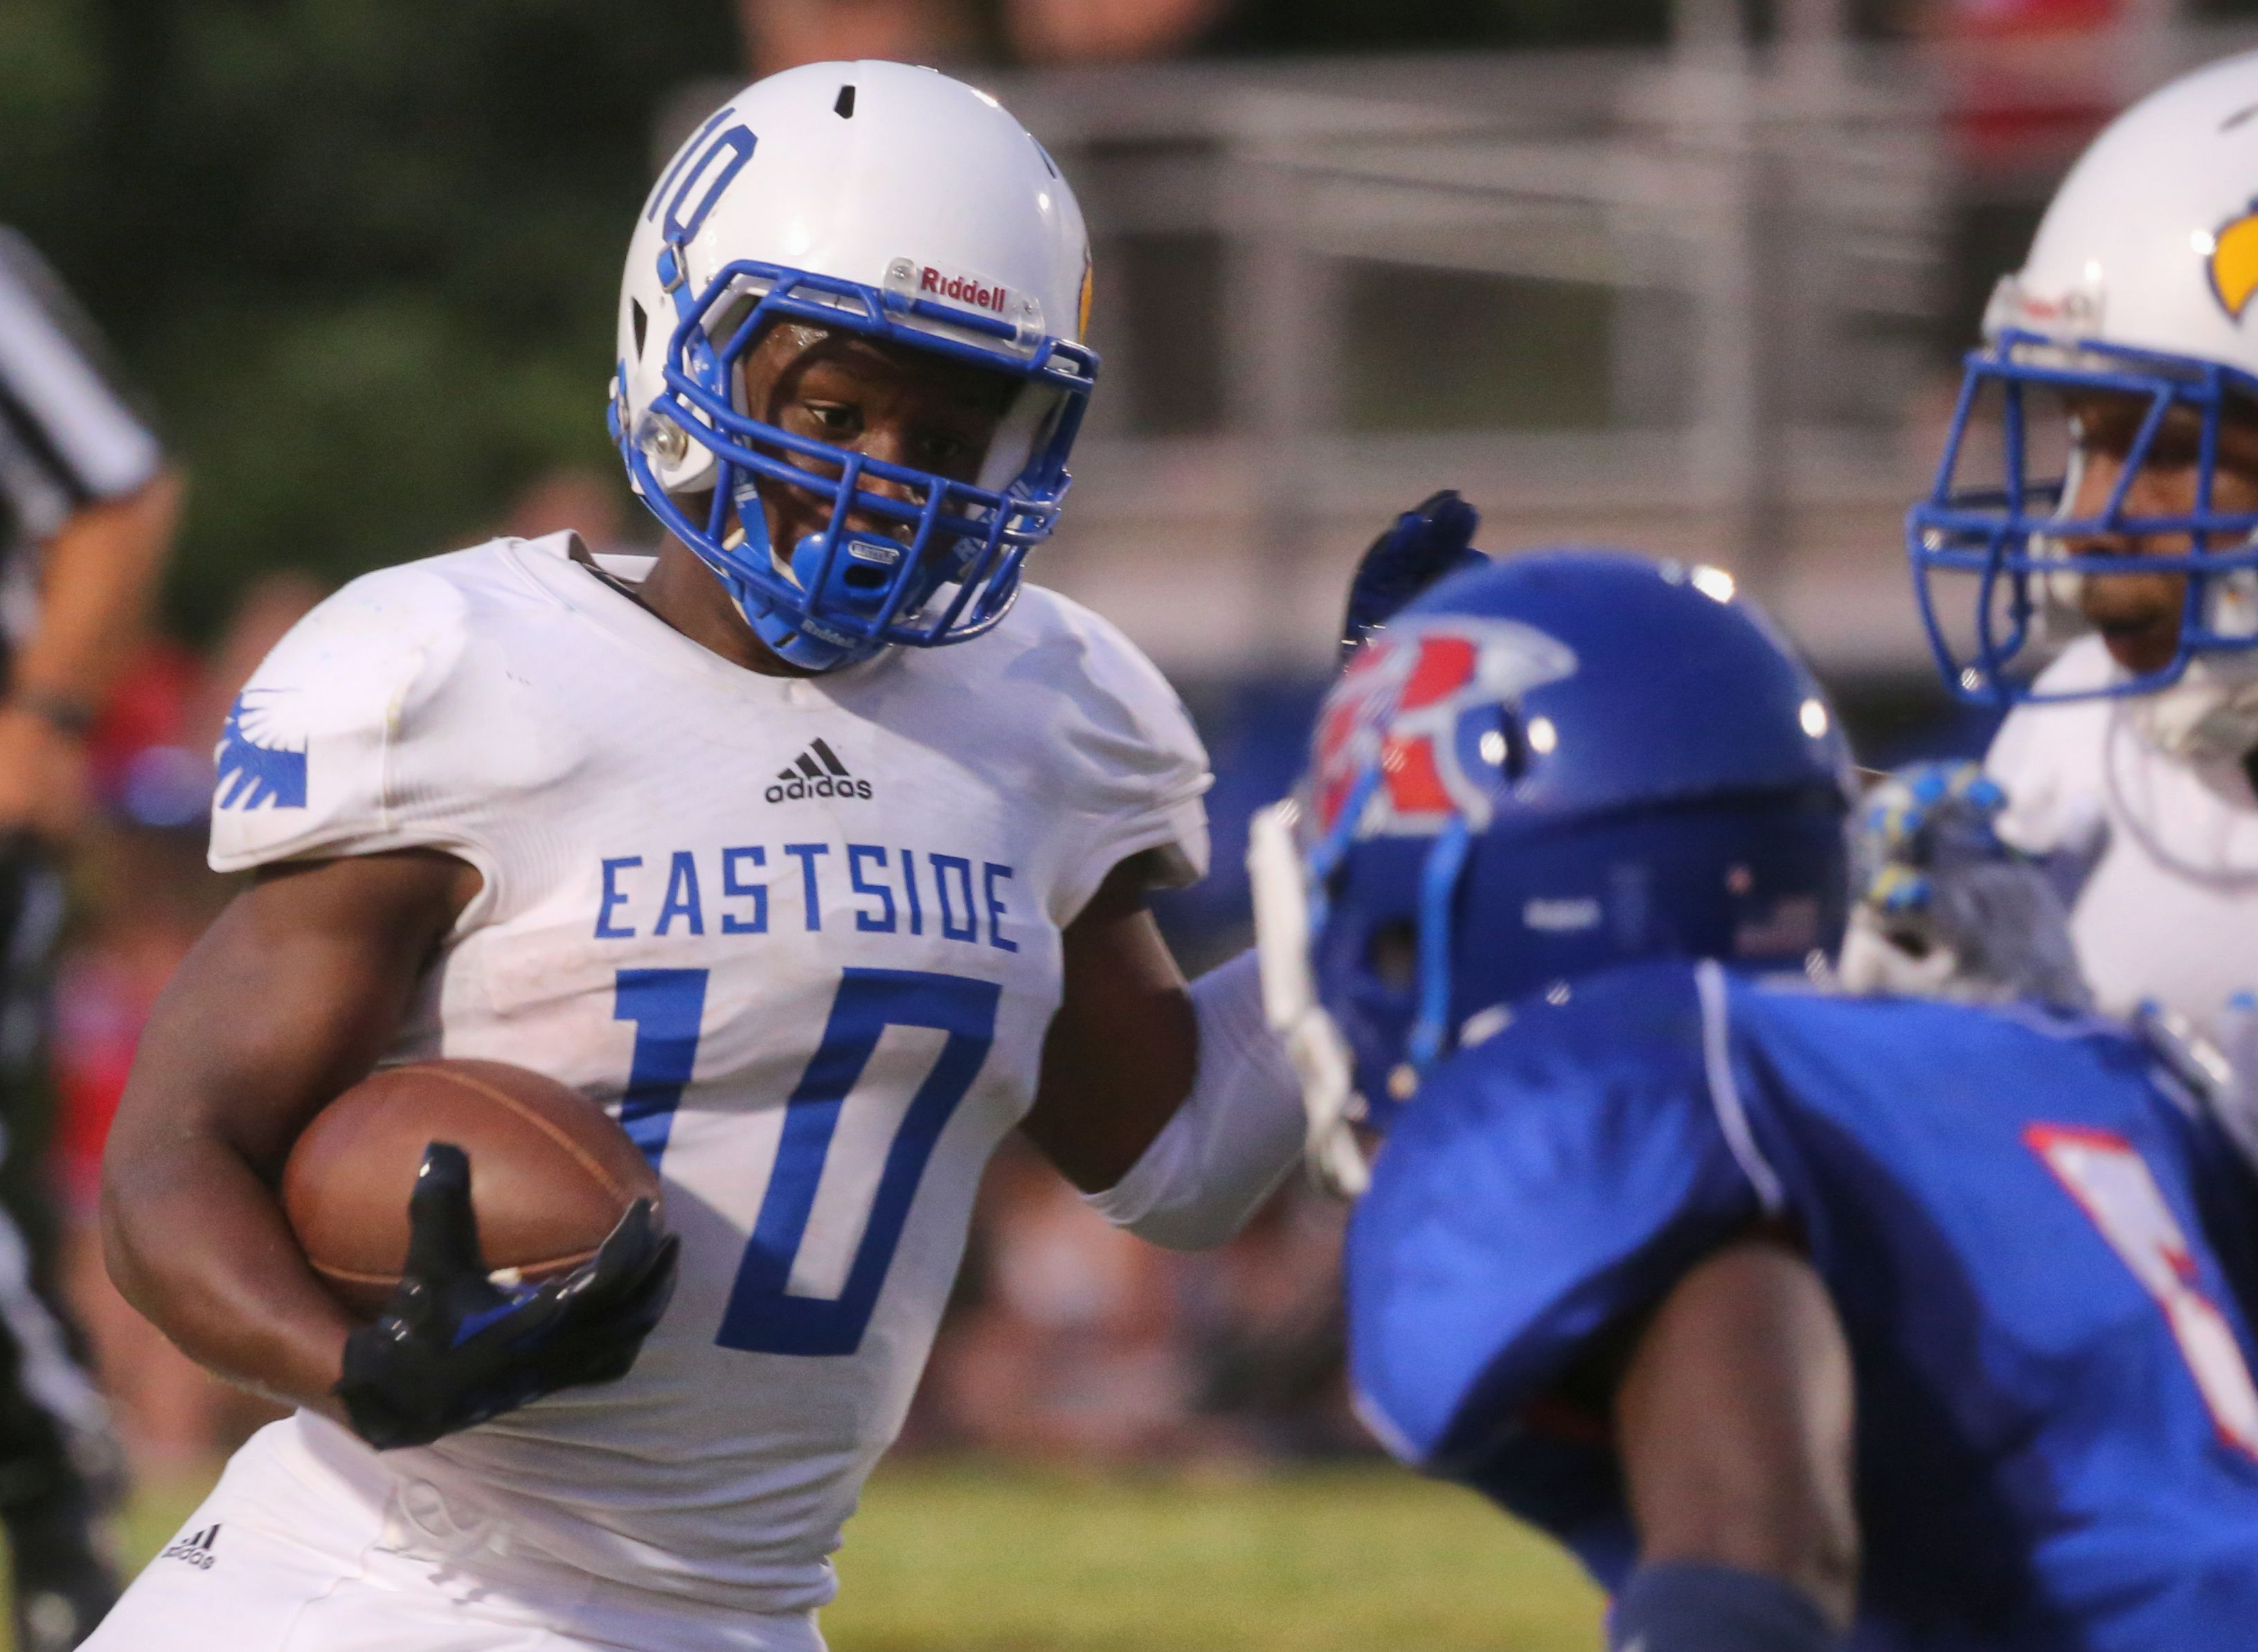 Eastside high school high school high school football